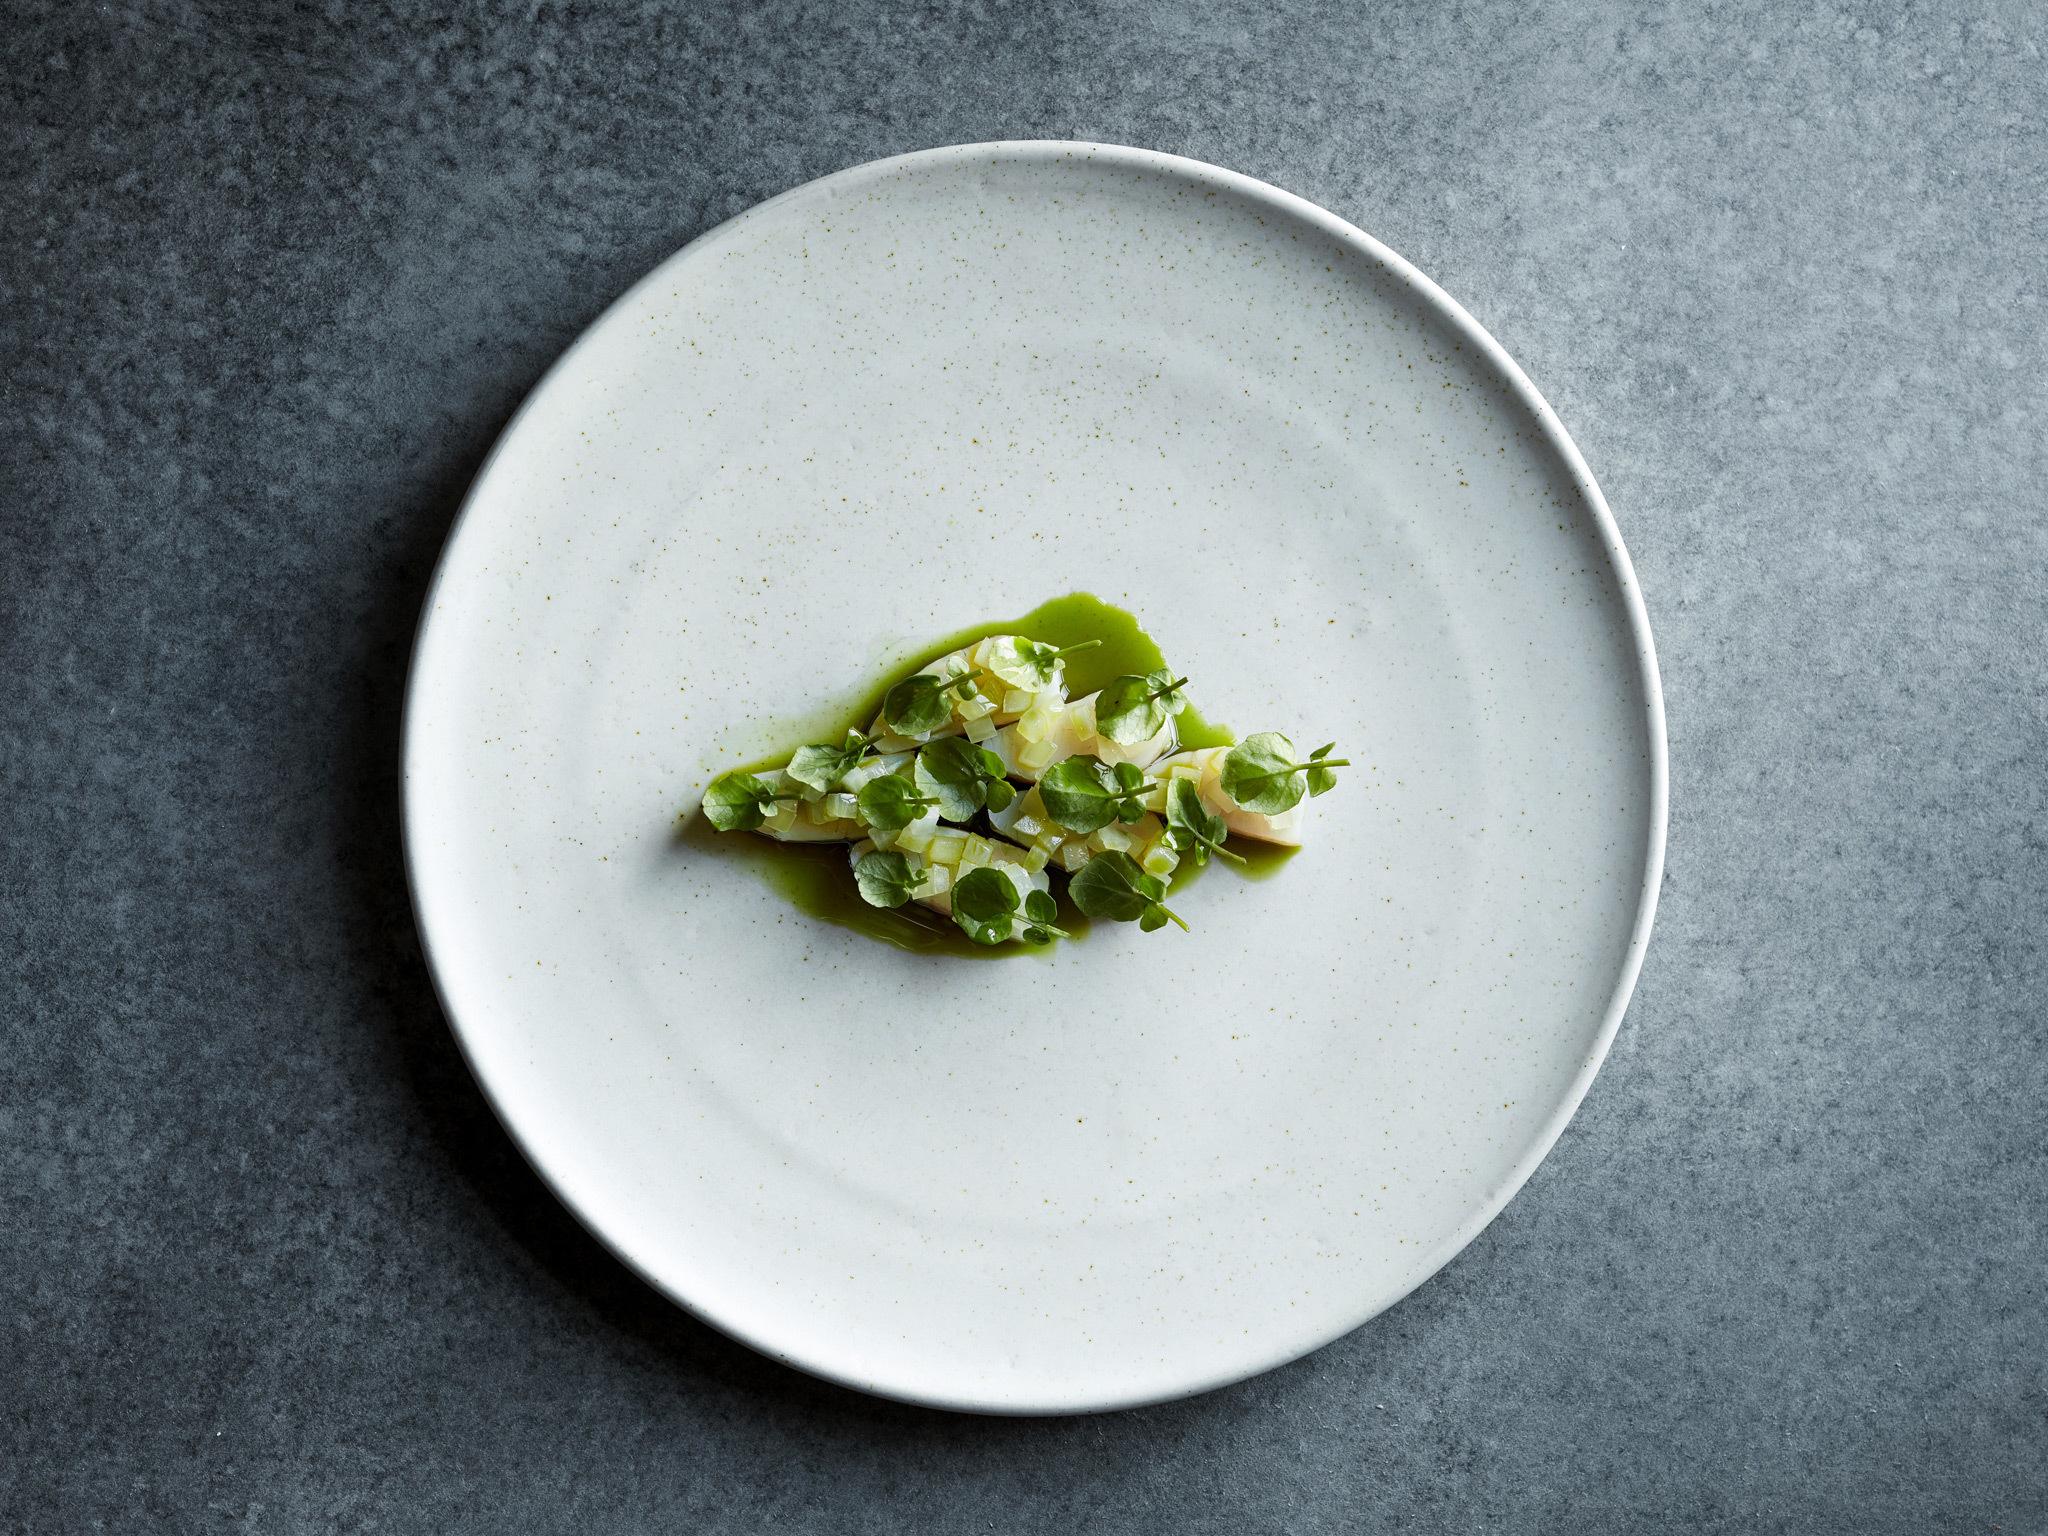 A dish at Amass restaurant in Copenhagen